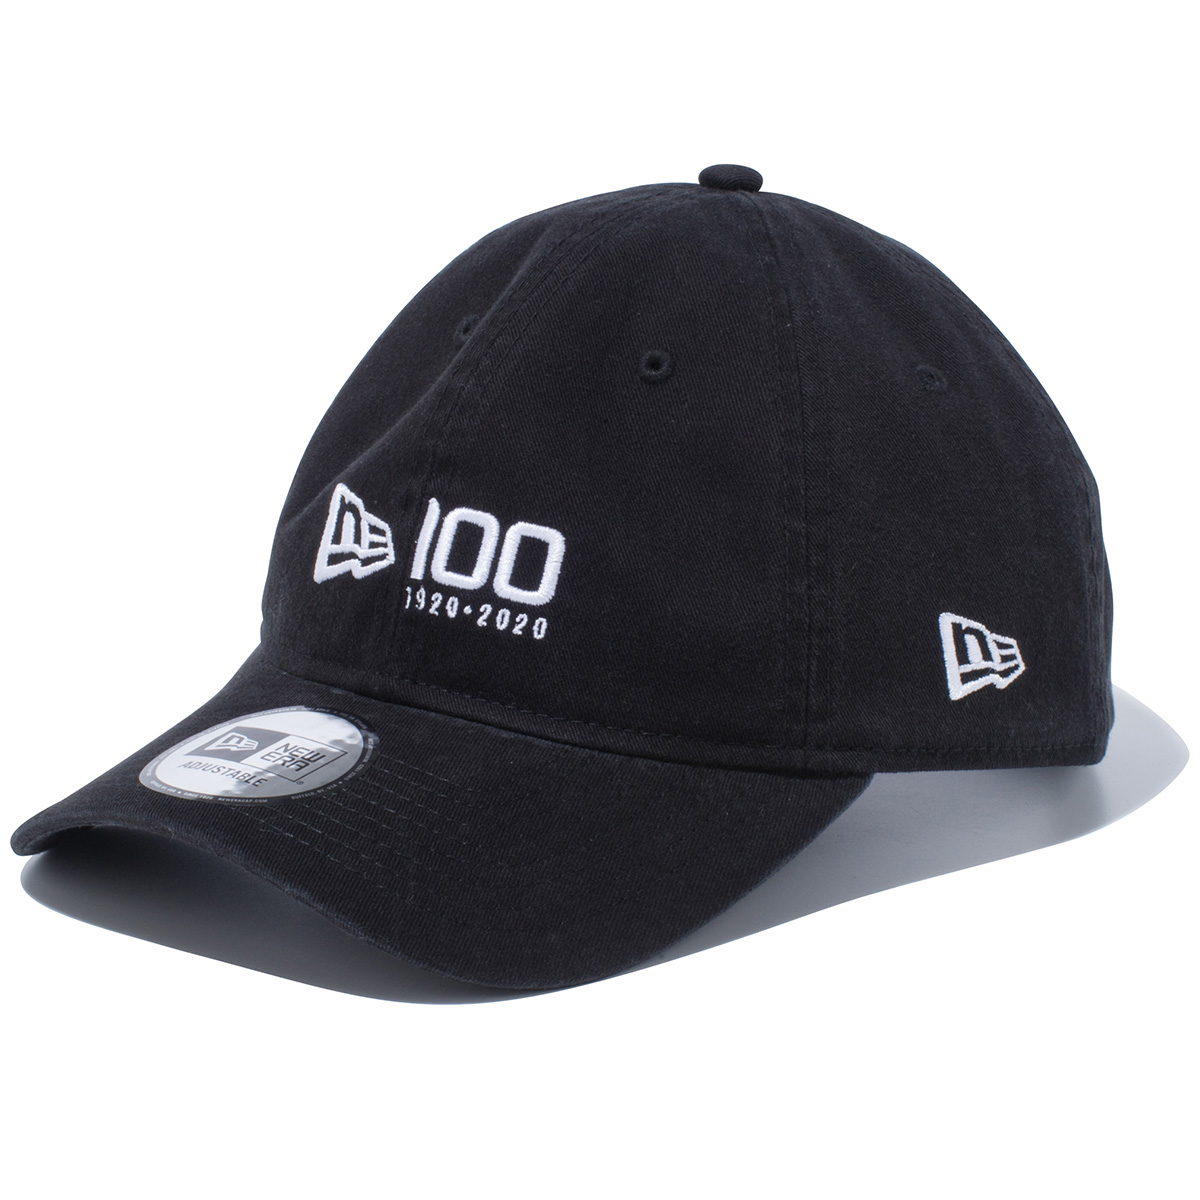 930 NEW ERA 100TH LOGO キャップ